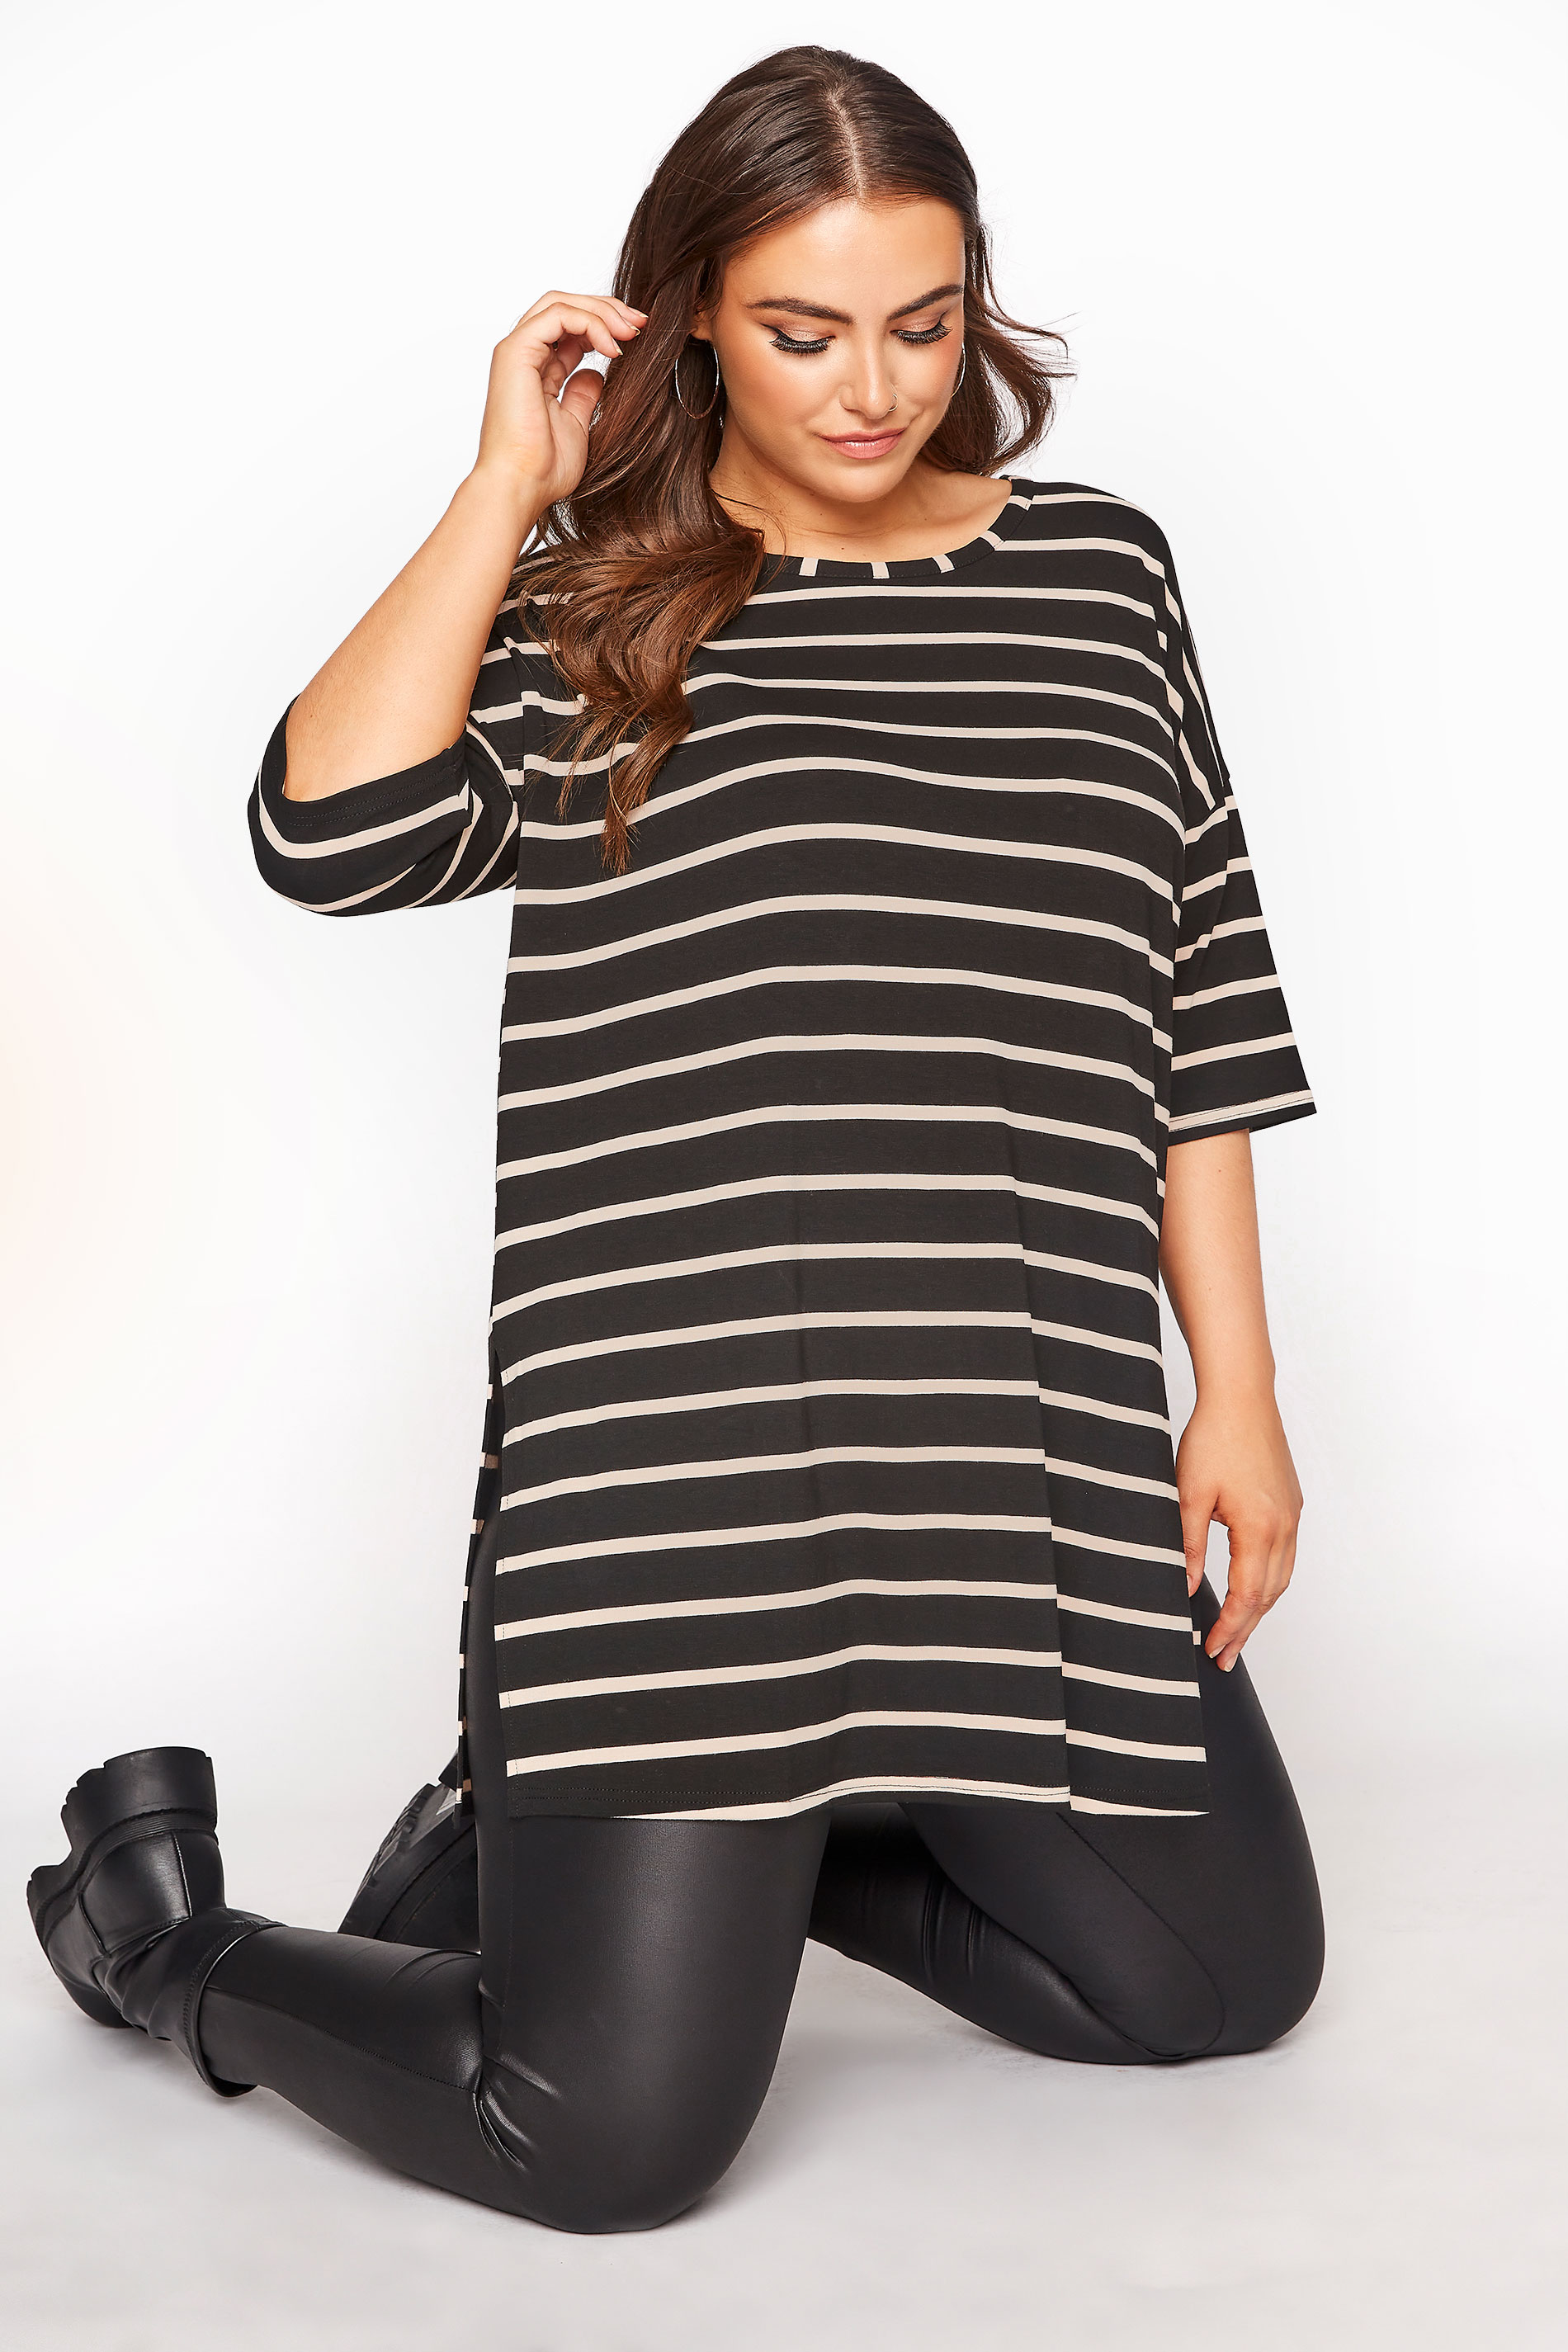 Black Striped Oversized T-shirt_A.jpg